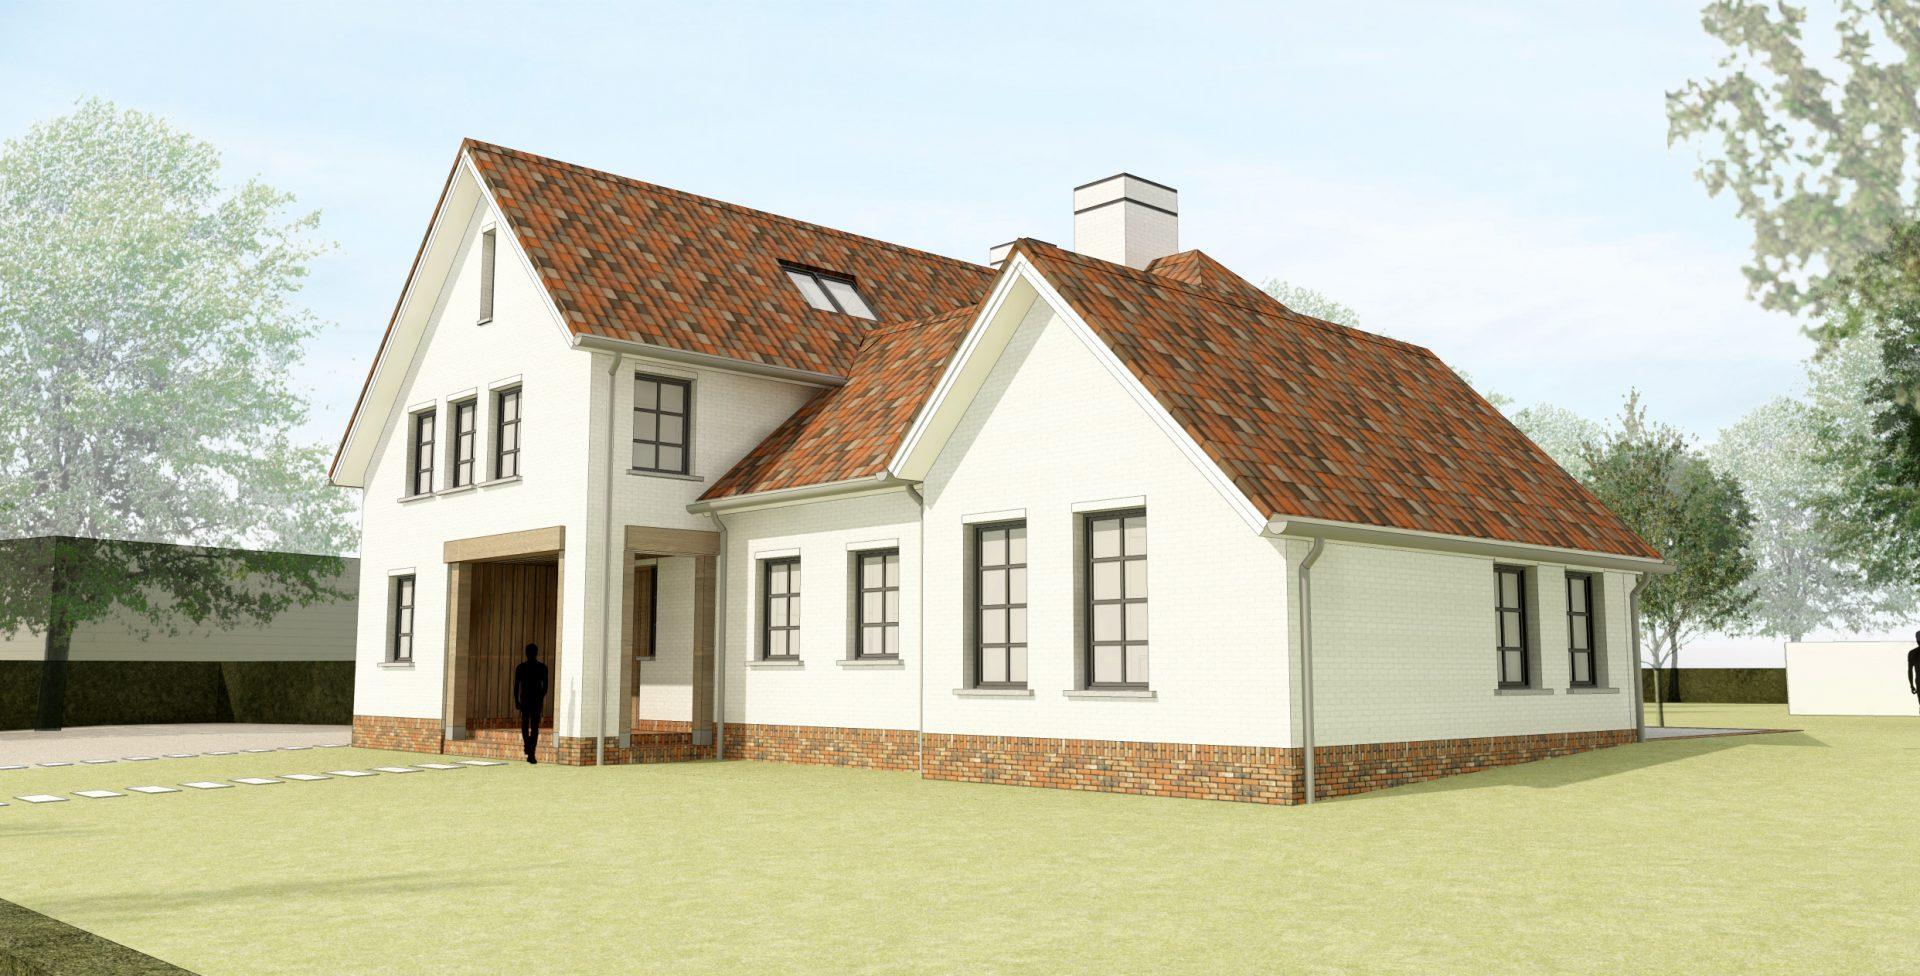 Nieuwbouw landelijke villa, Son